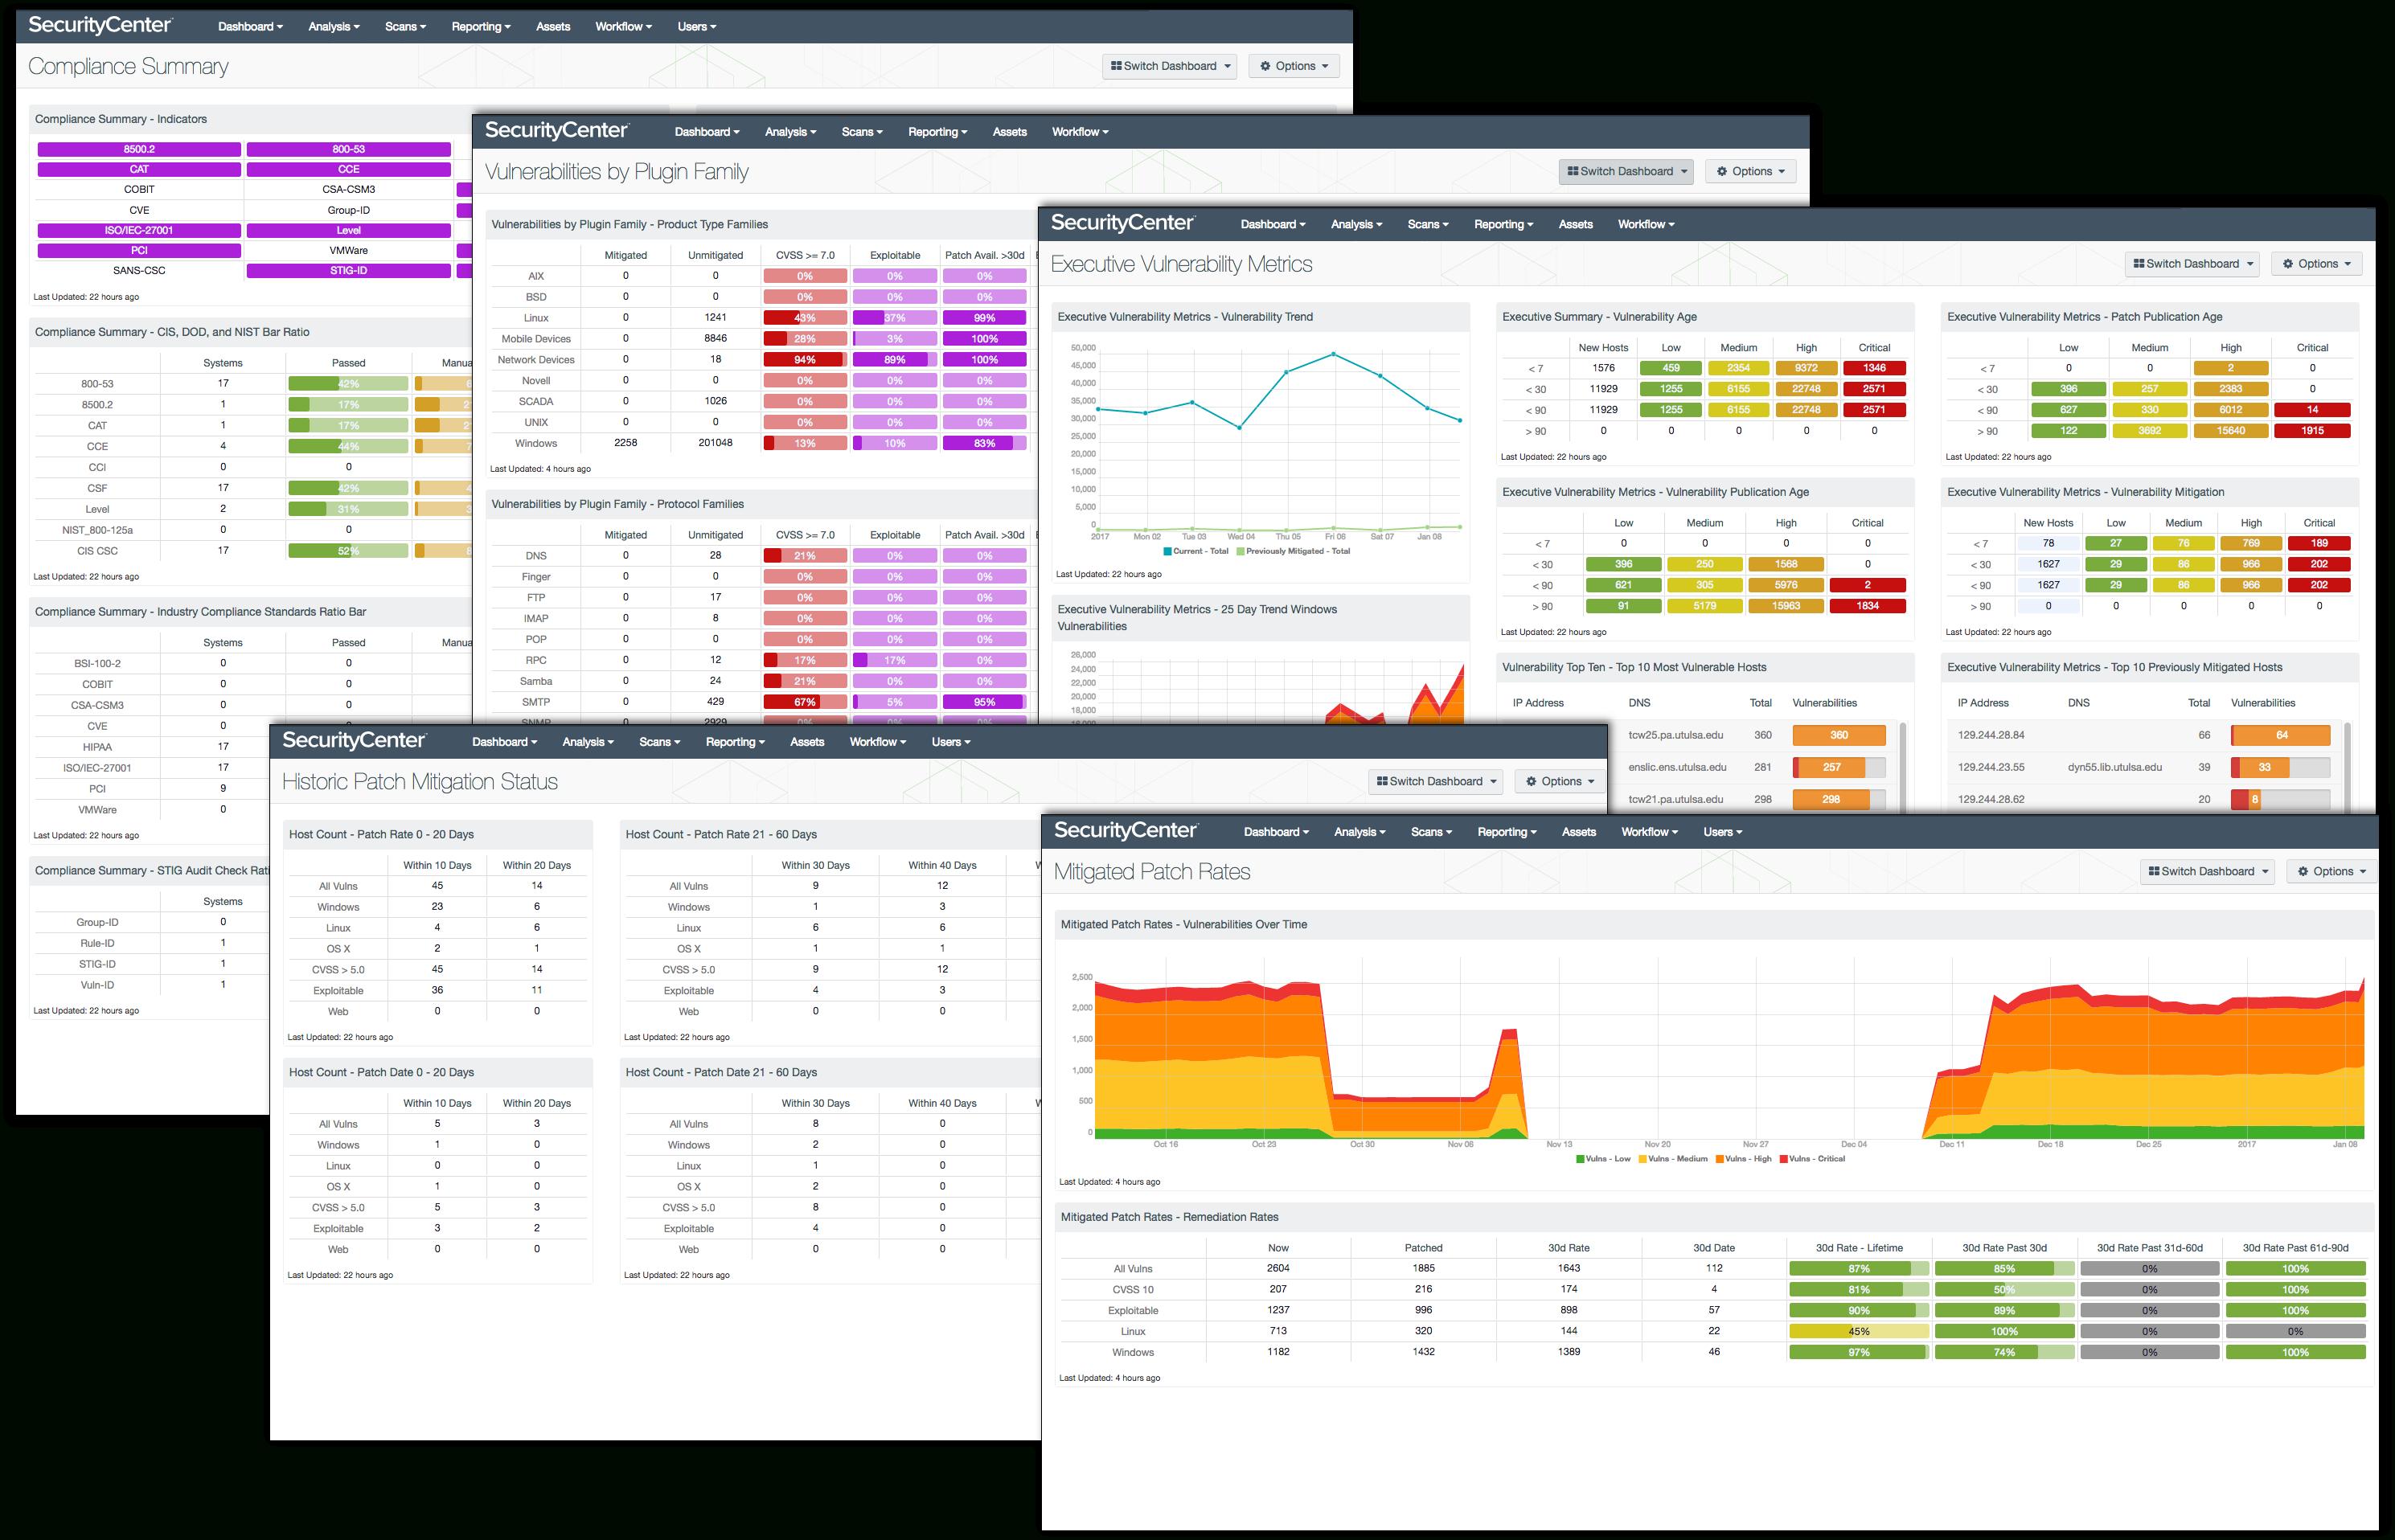 Patch Management Tracking Spreadsheet Inside Vulnerability Management Metrics  Blog  Tenable®